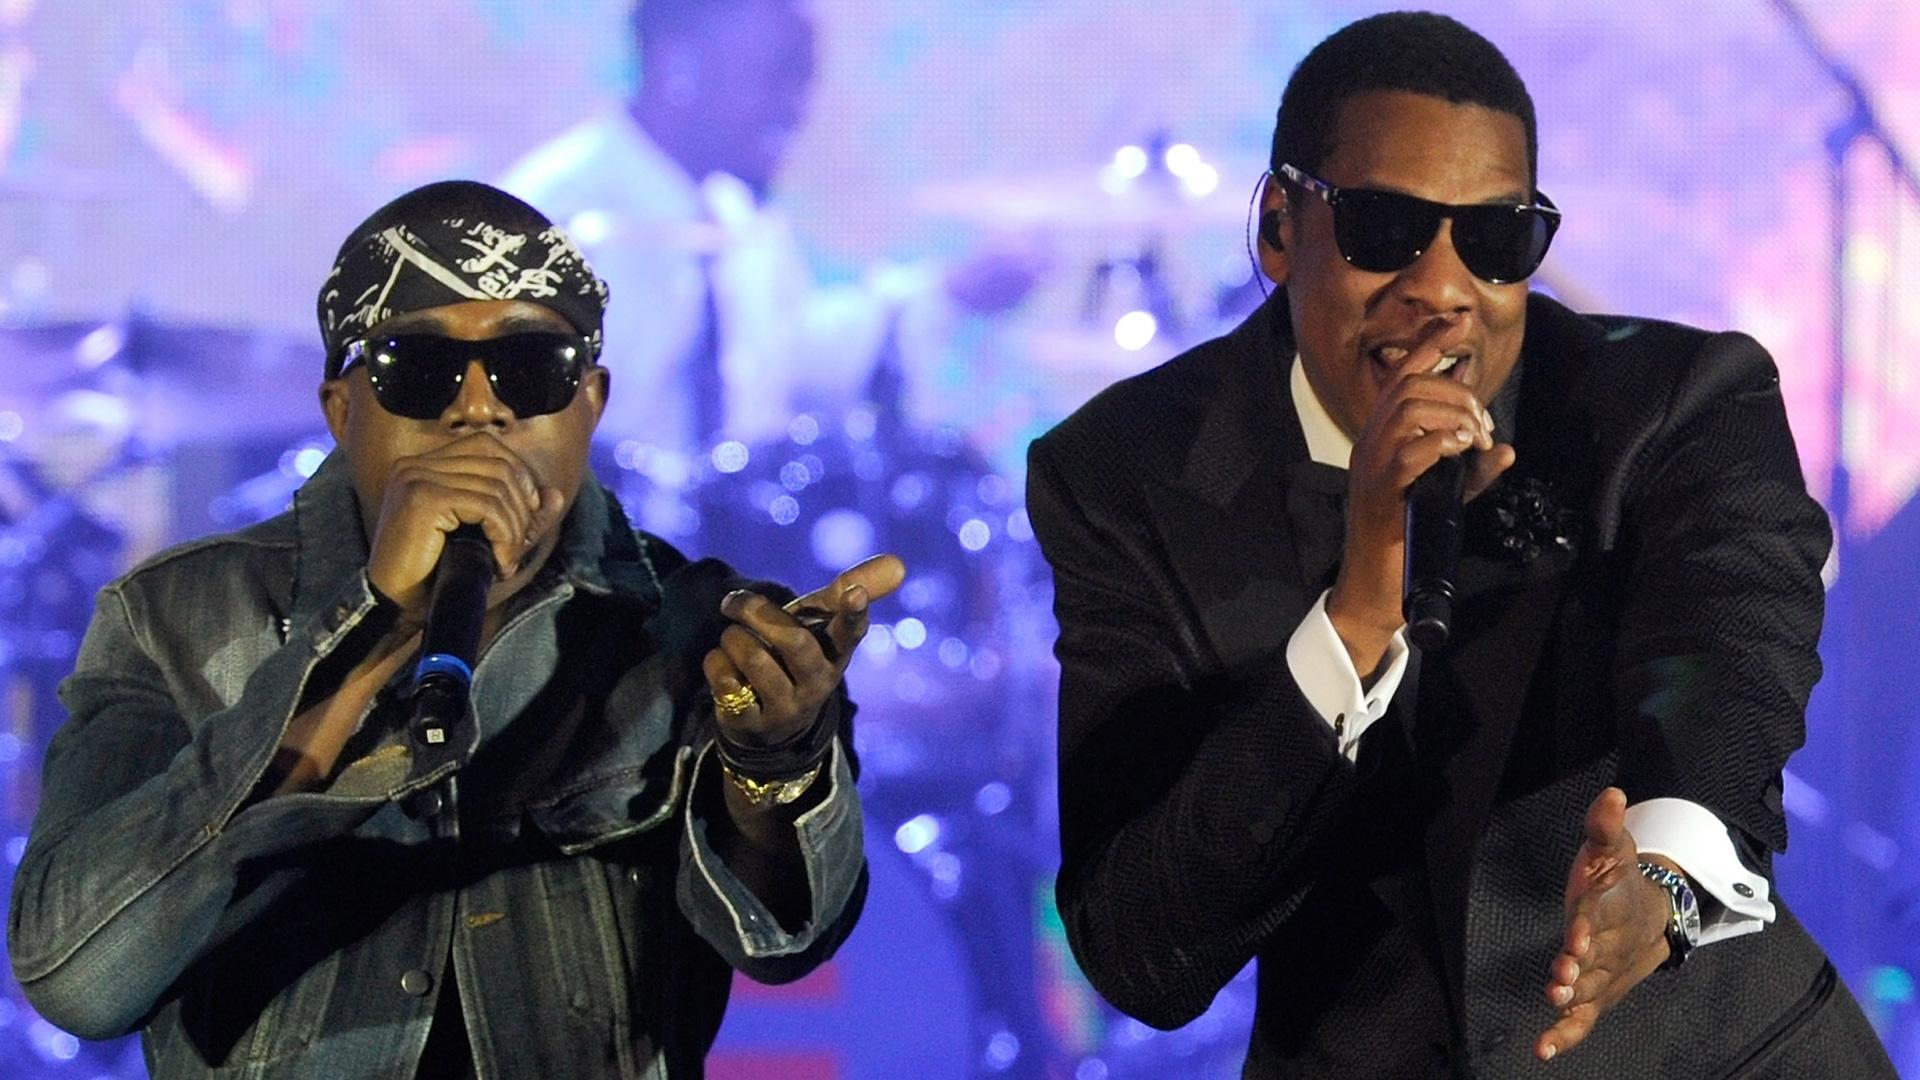 Wallpaper Sunglasses Glasses Gentleman Music Artist